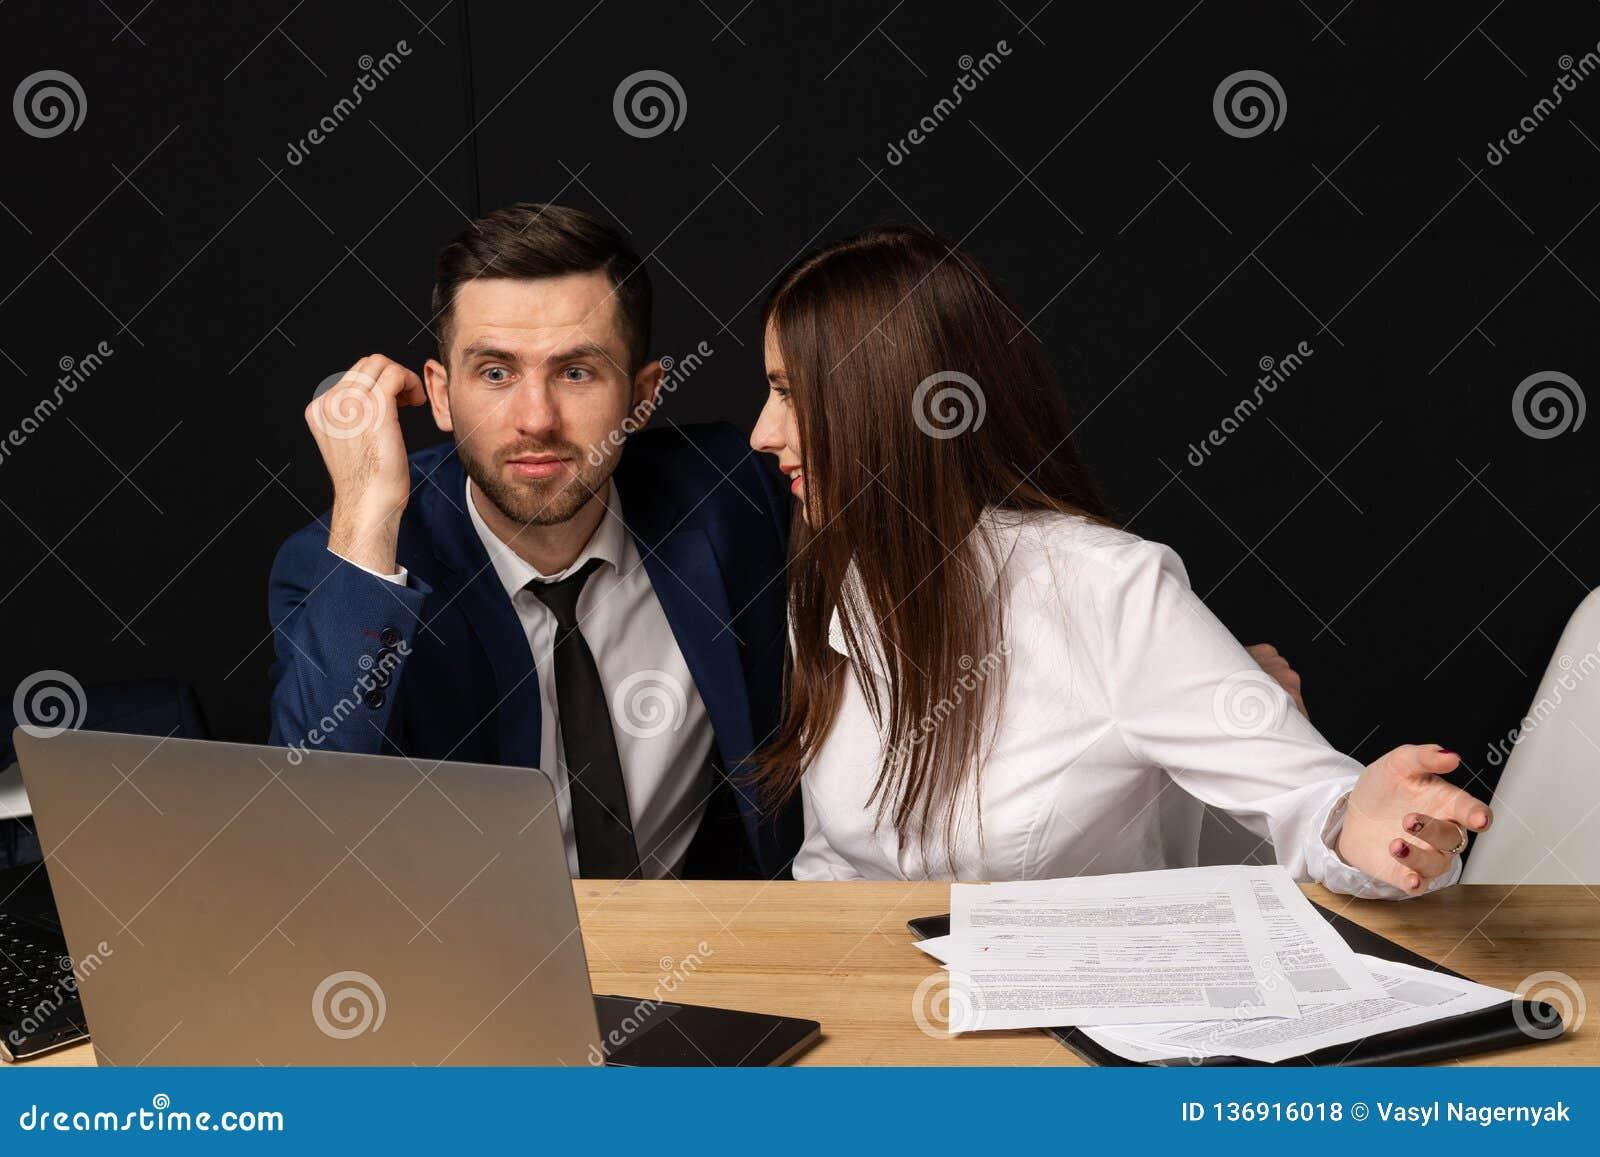 Company executiv coaching young personal secretary assistent